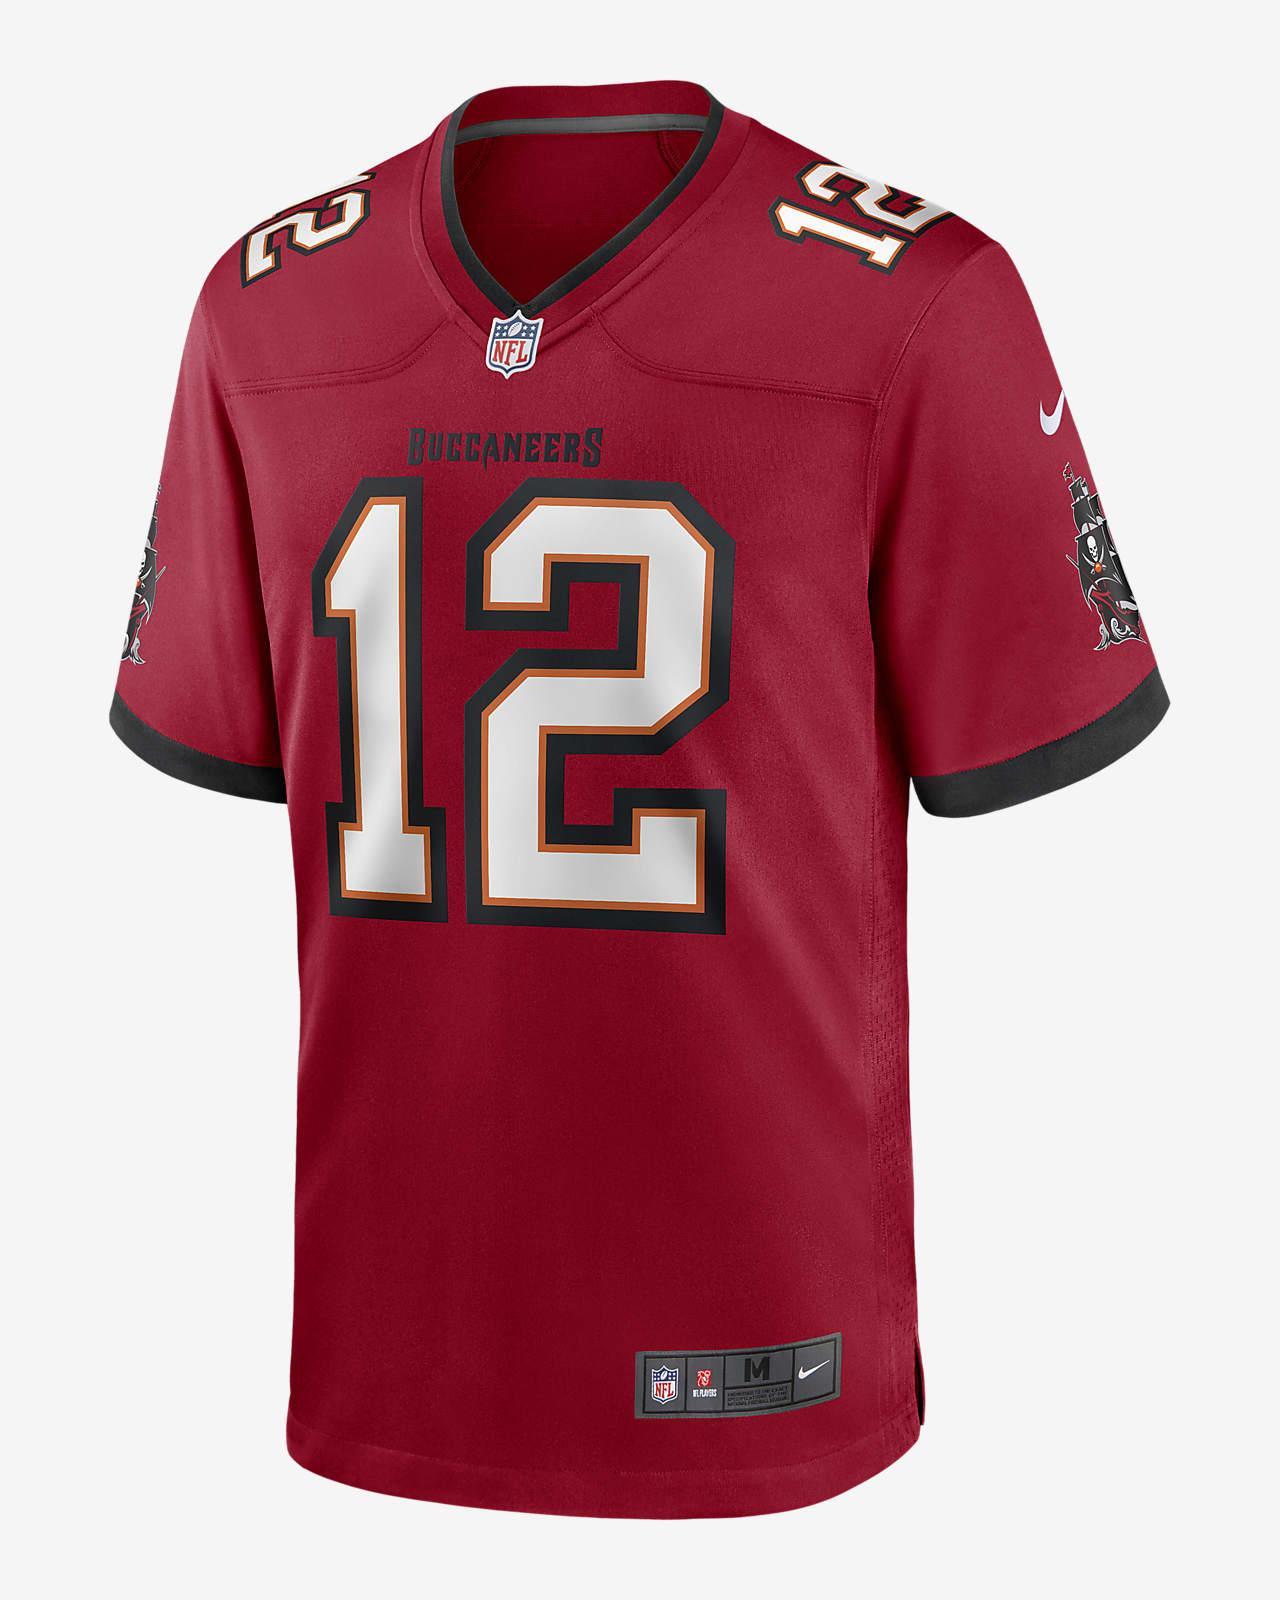 Camiseta game para hombre NFL Tampa Bay Buccaneers (Tom Brady)